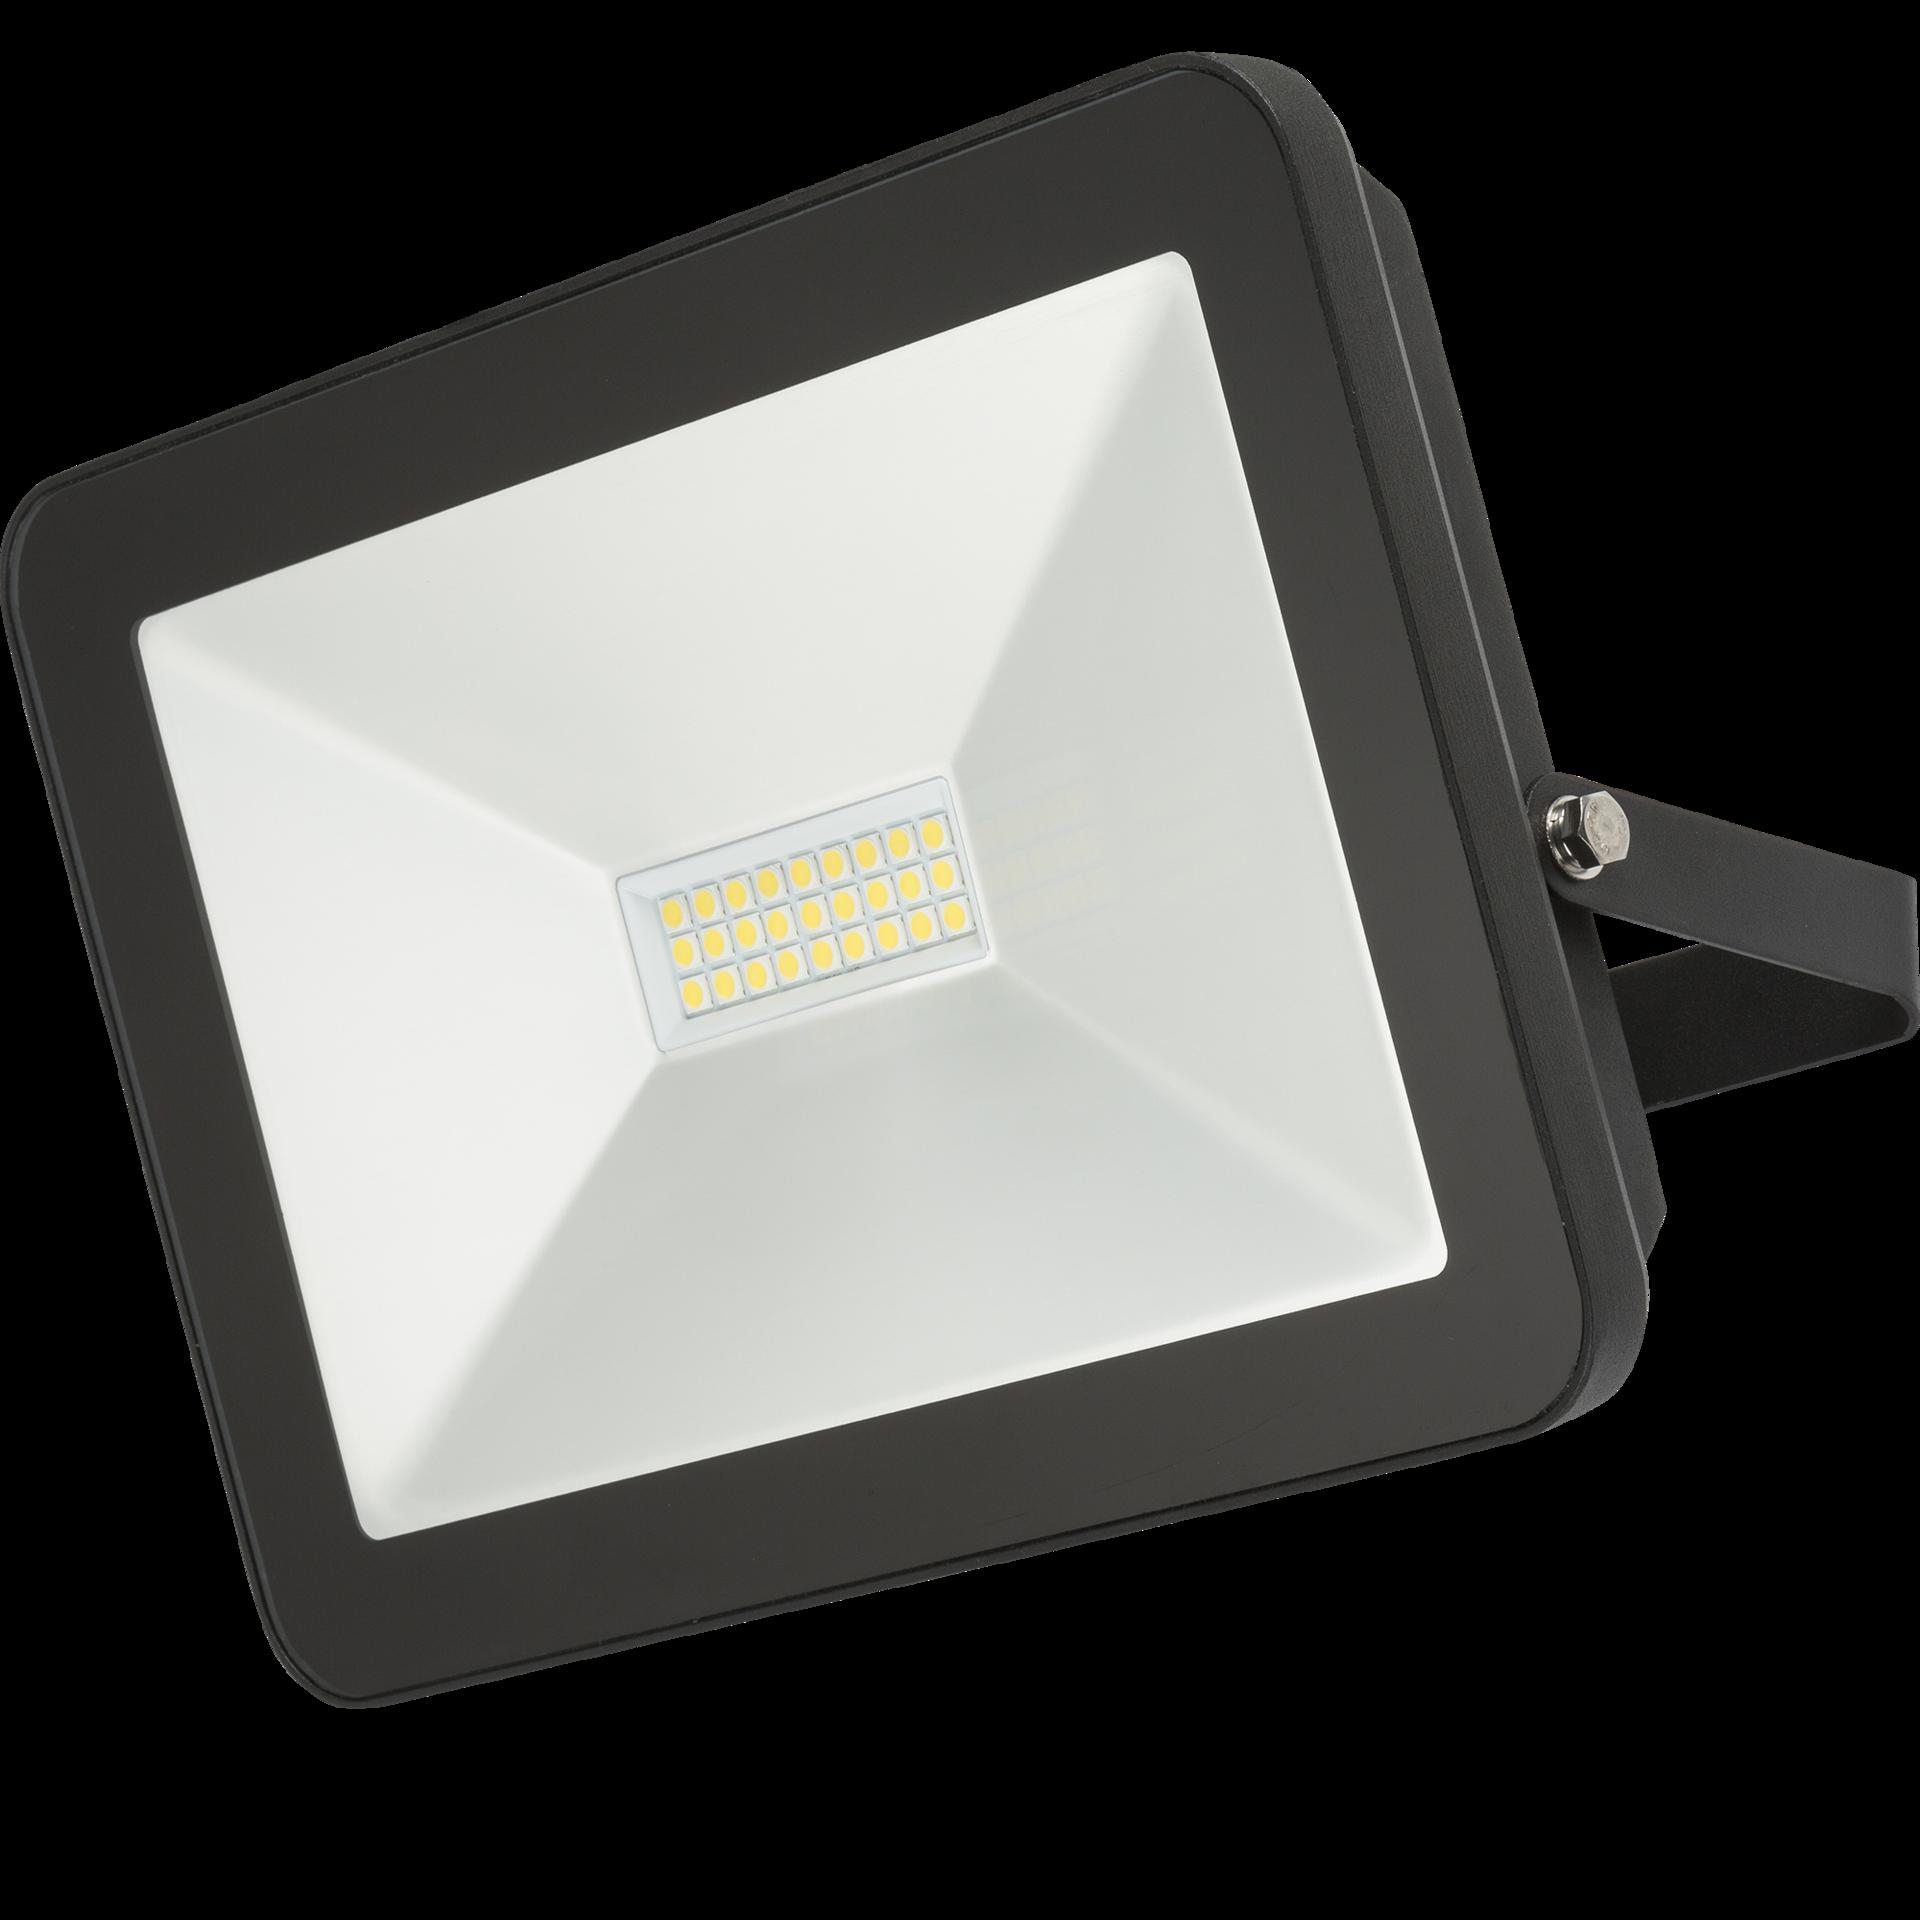 230V IP65 100W LED Black Die-Cast Aluminium Floodlight 4000K